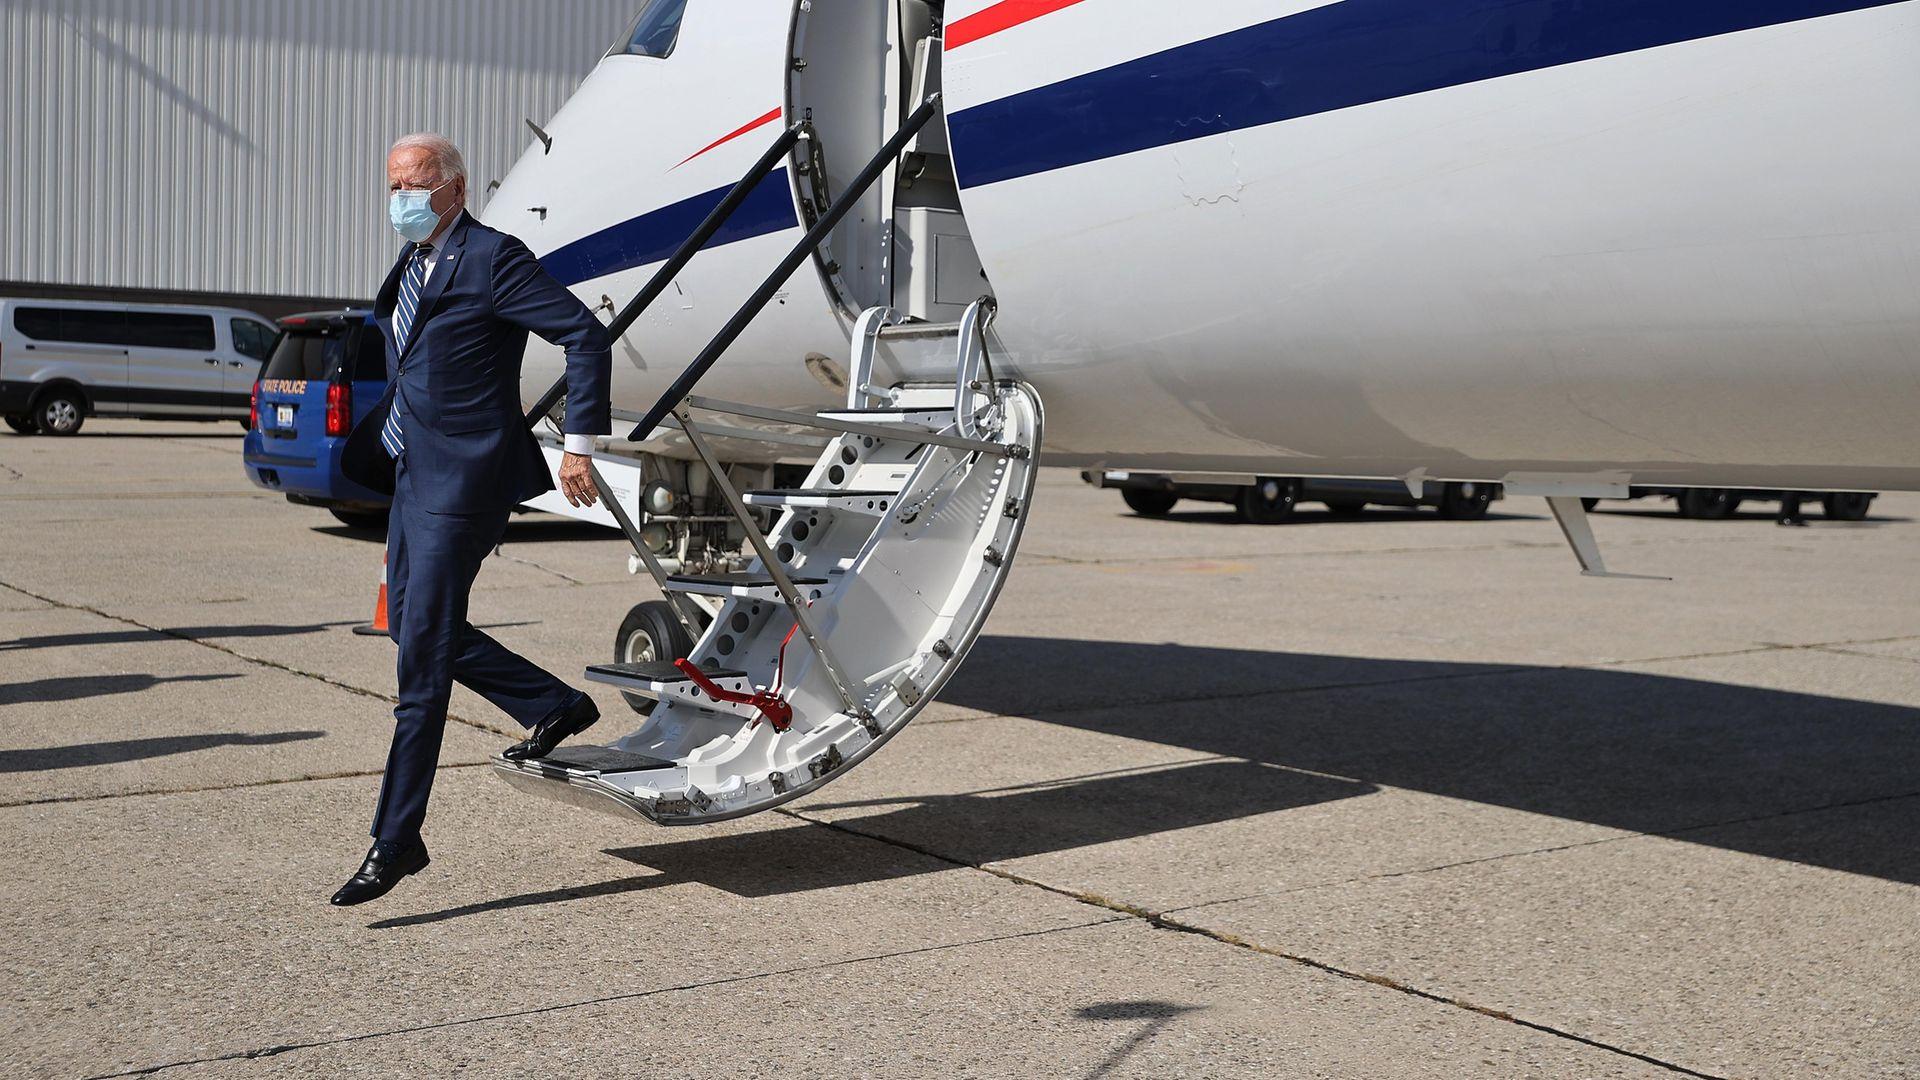 Joe Biden campaigns in Michigan. - Credit: Getty Images